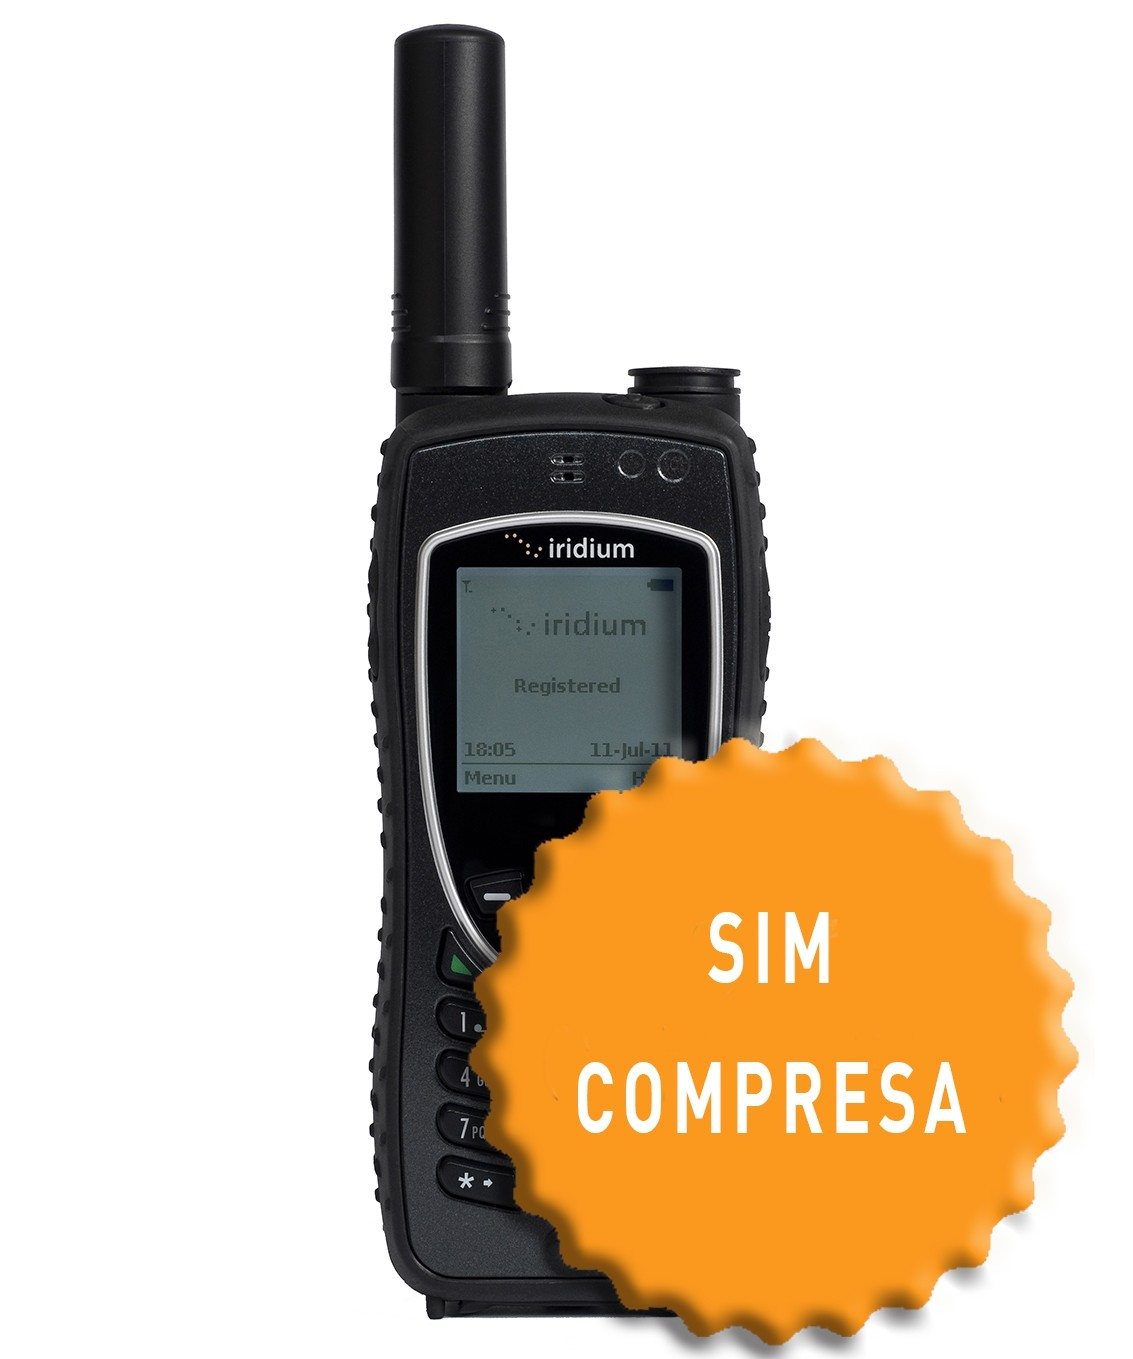 Iridium 9575 Extreme con SIM